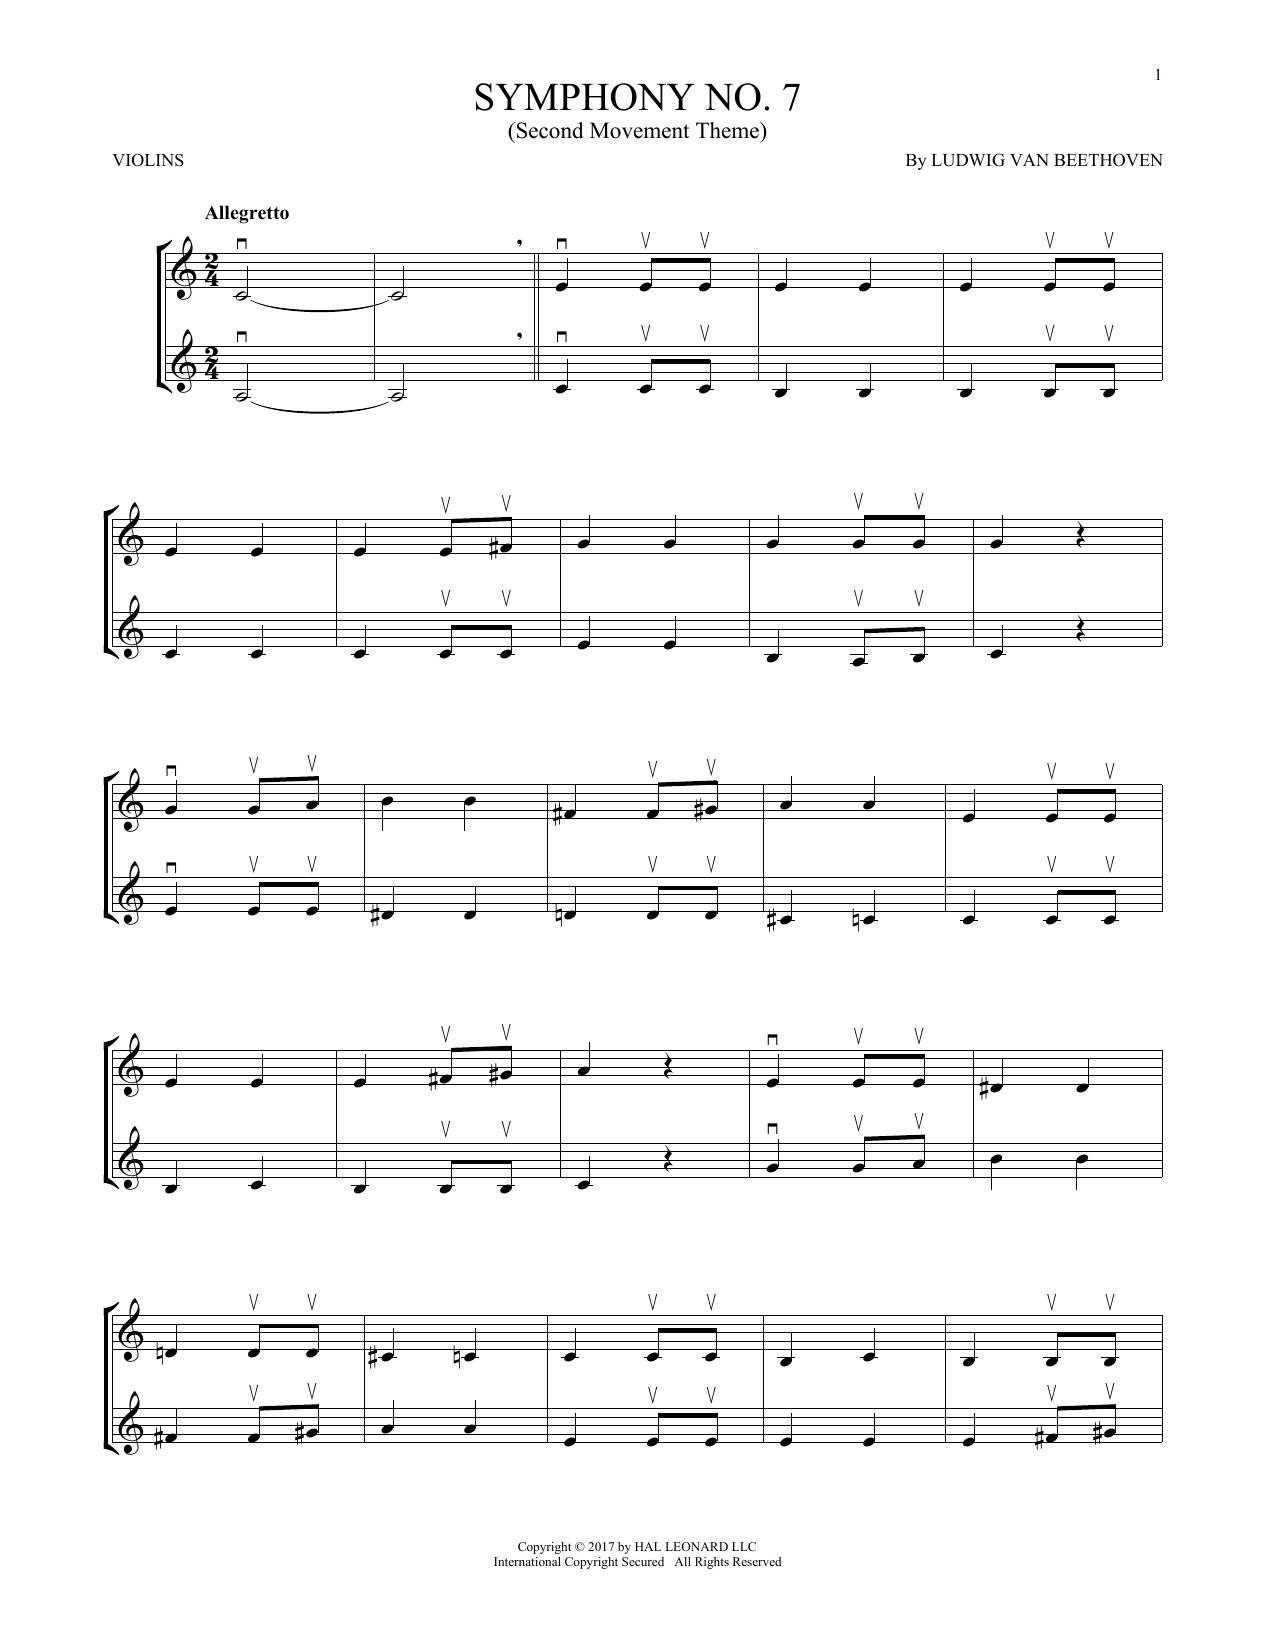 Symphony No. 7 In A Major, Second Movement (Allegretto) (Violin Duet)